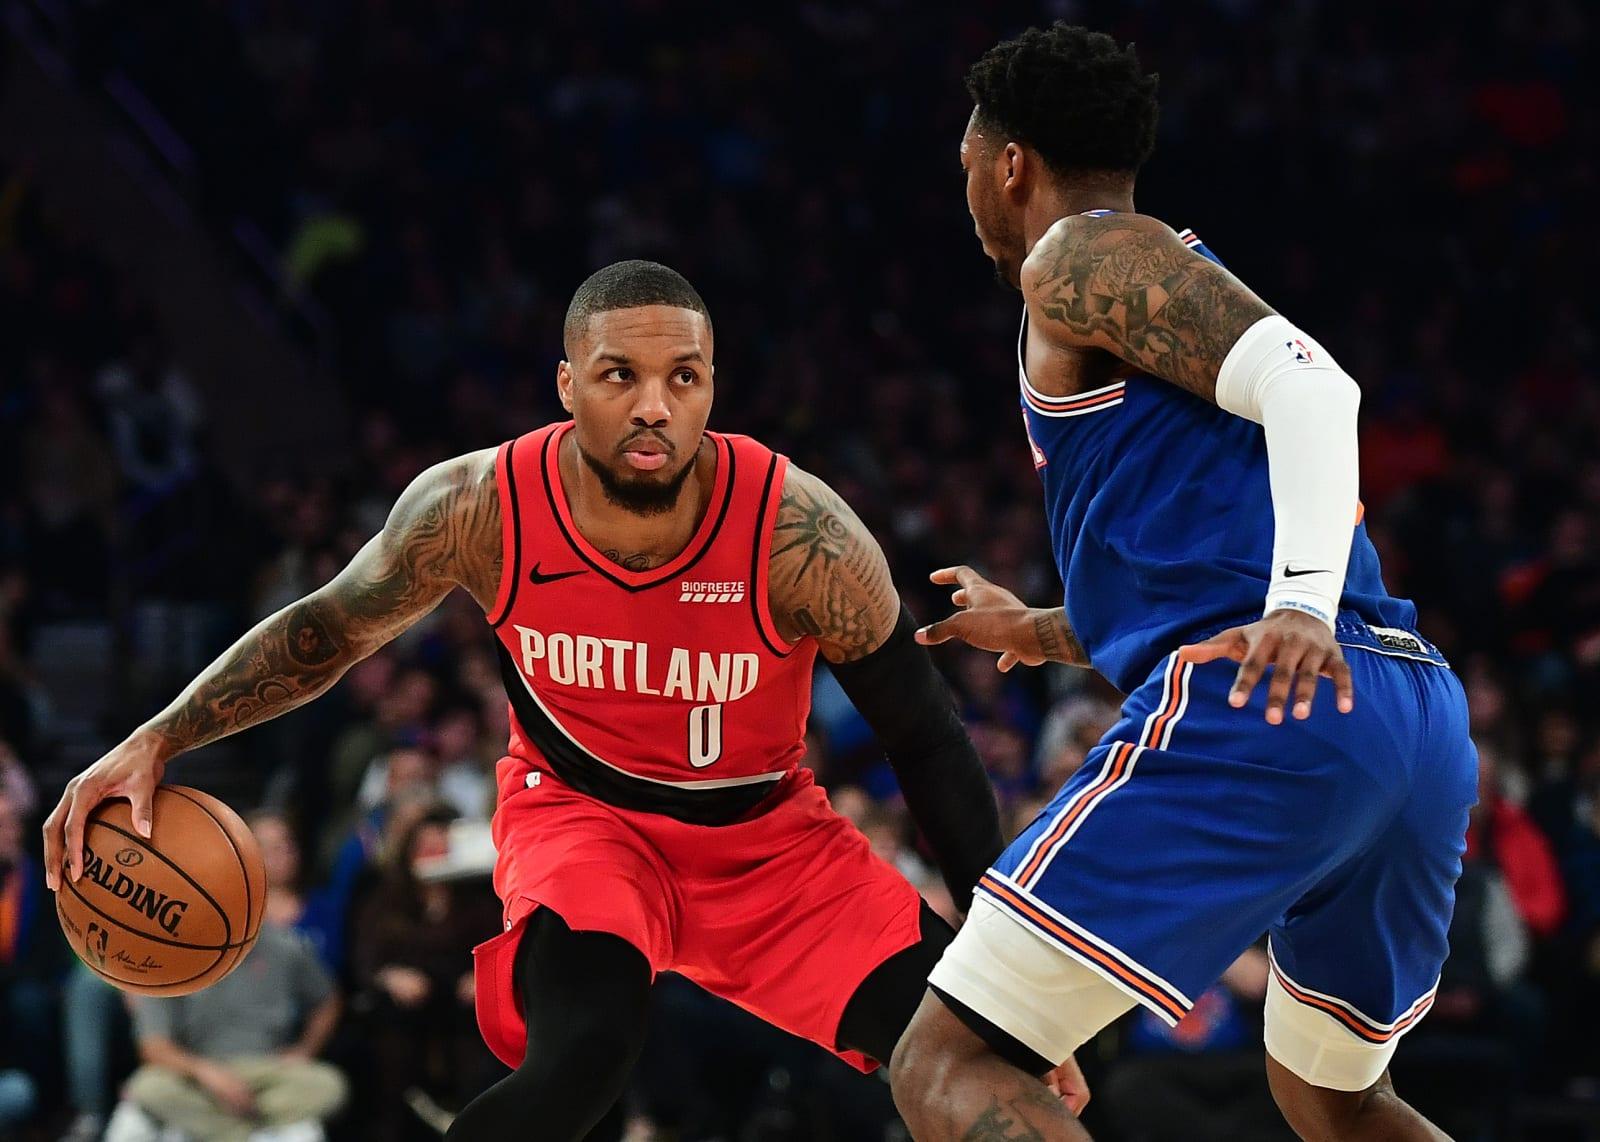 Damian Lillard, Elfrid Payton, New York Knicks, Portland Trail Blazers